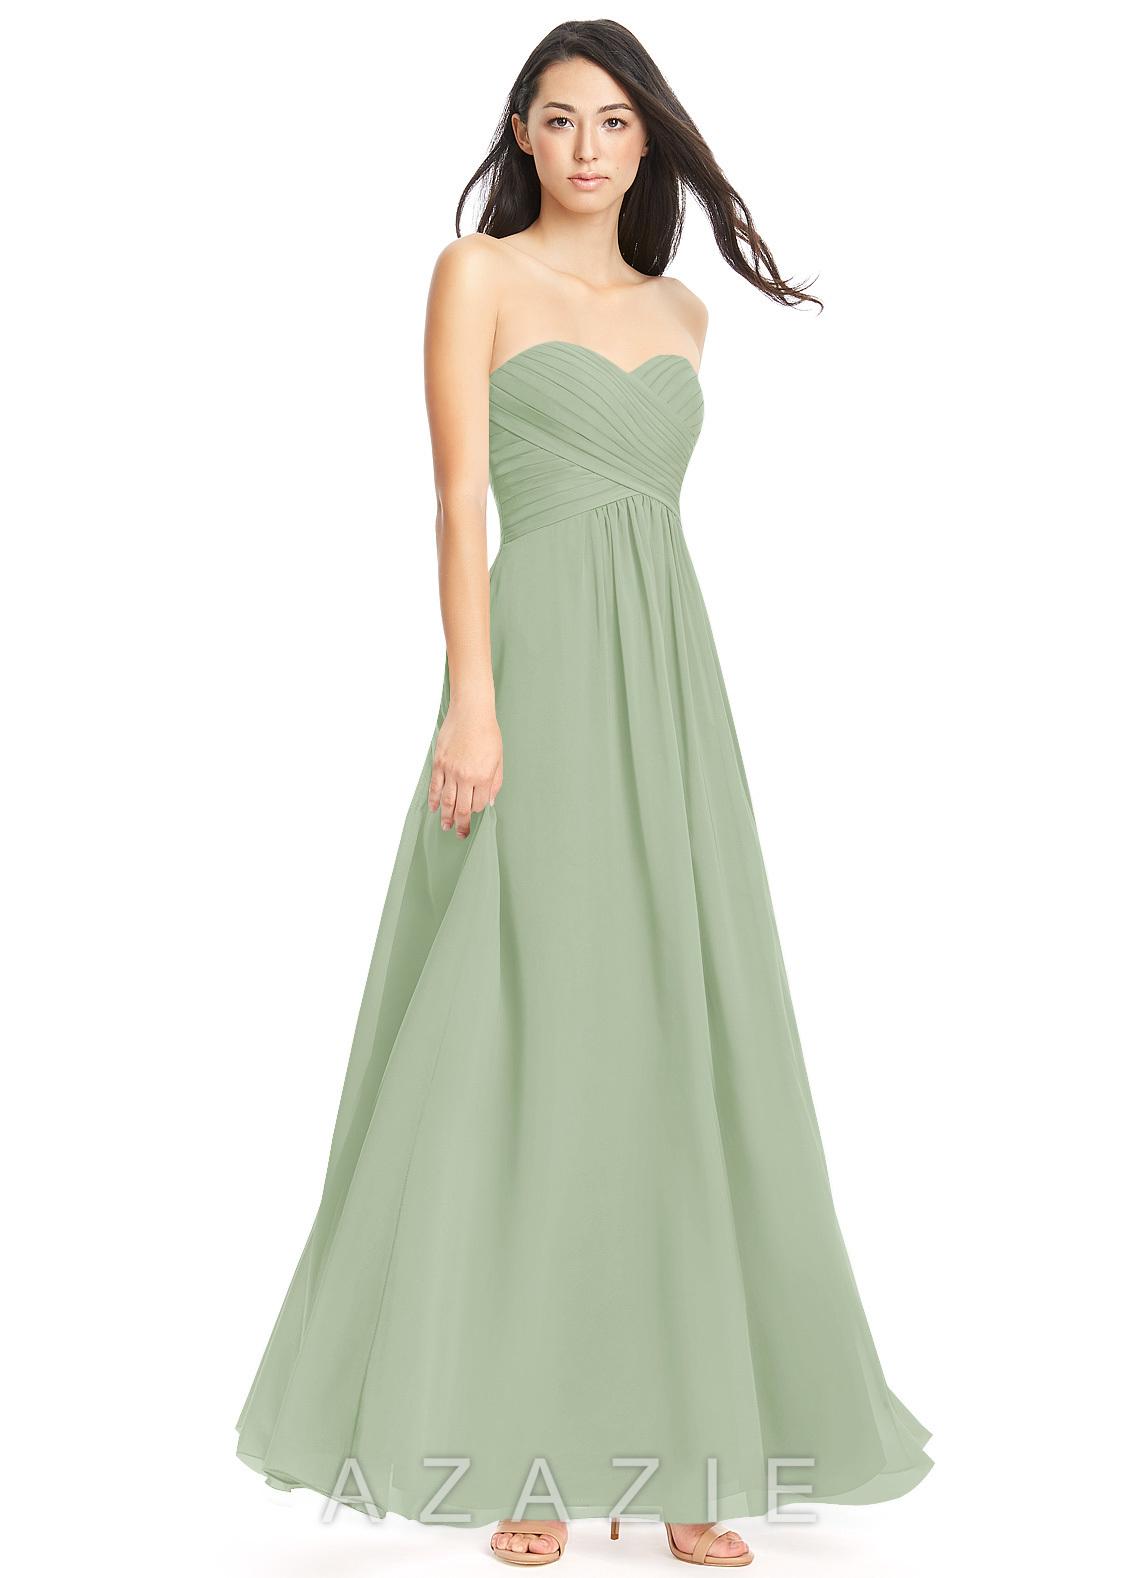 abc3923e23f Azazie Yazmin Bridesmaid Dress - Dusty Sage